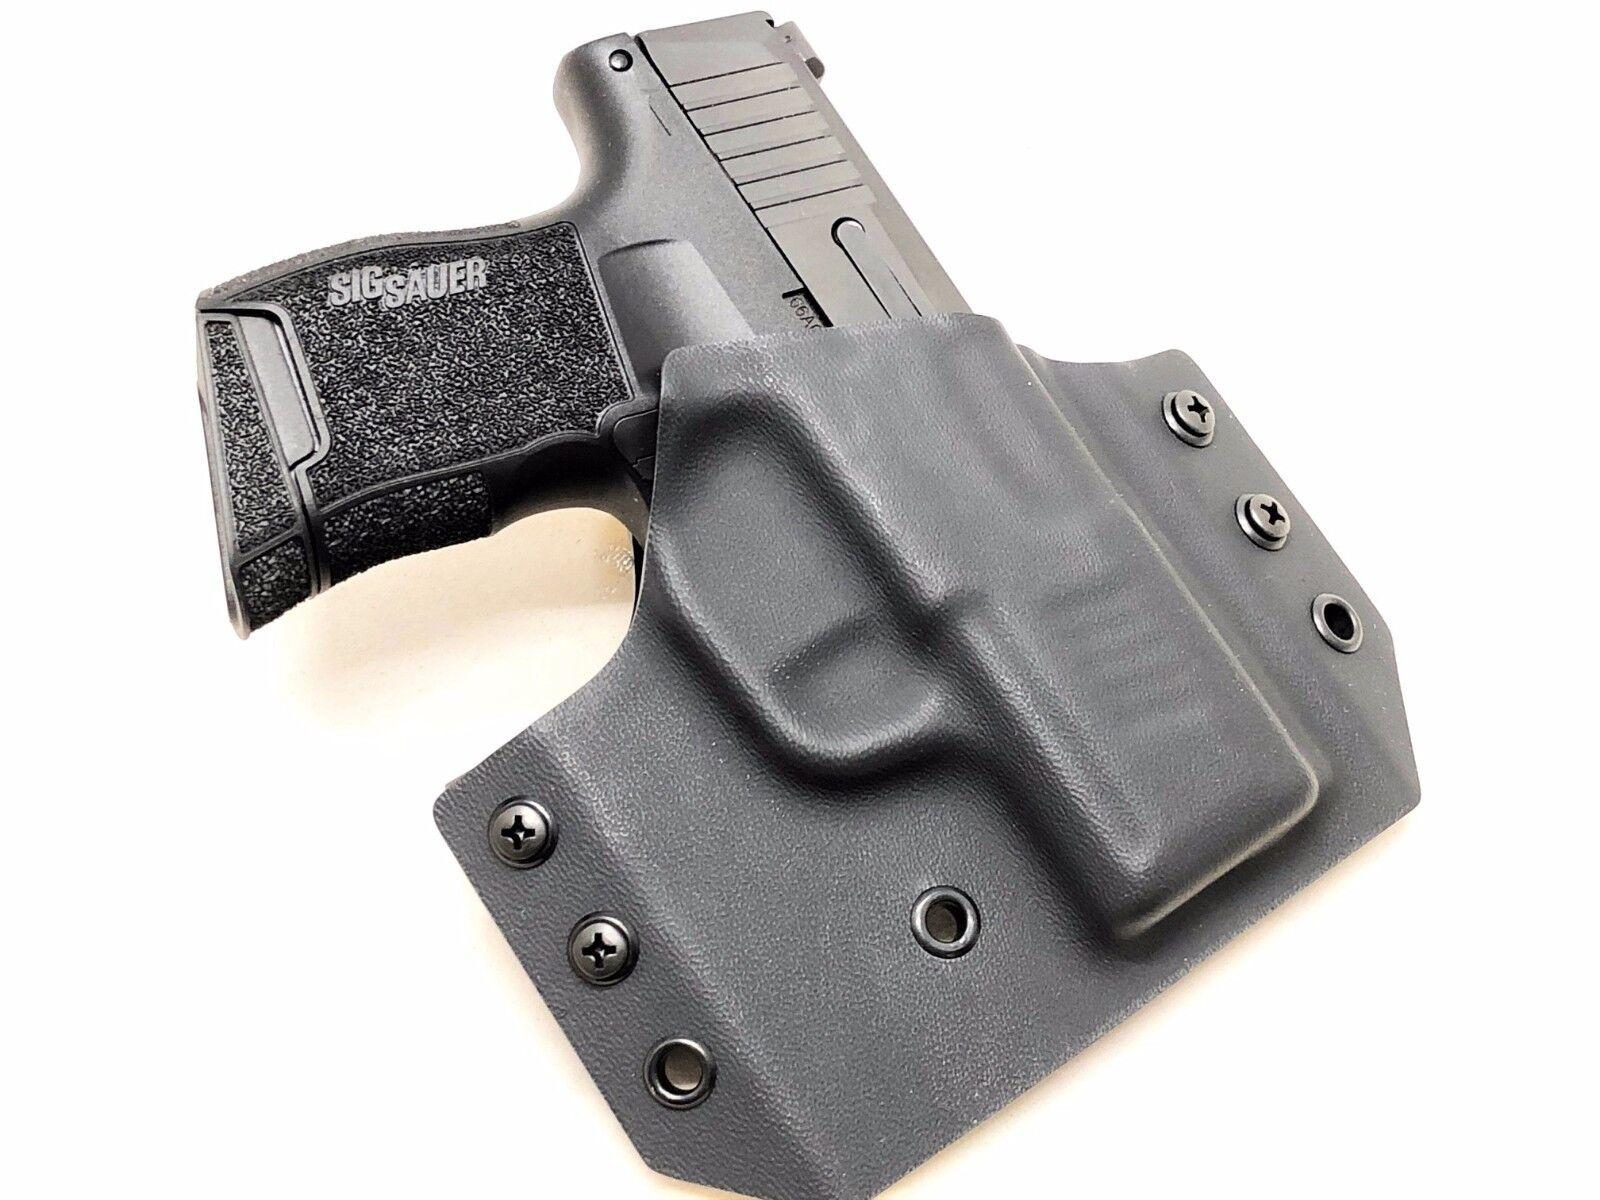 Kydex Gun Holster- for Sig P365 - MOLLE or Belt Mounted